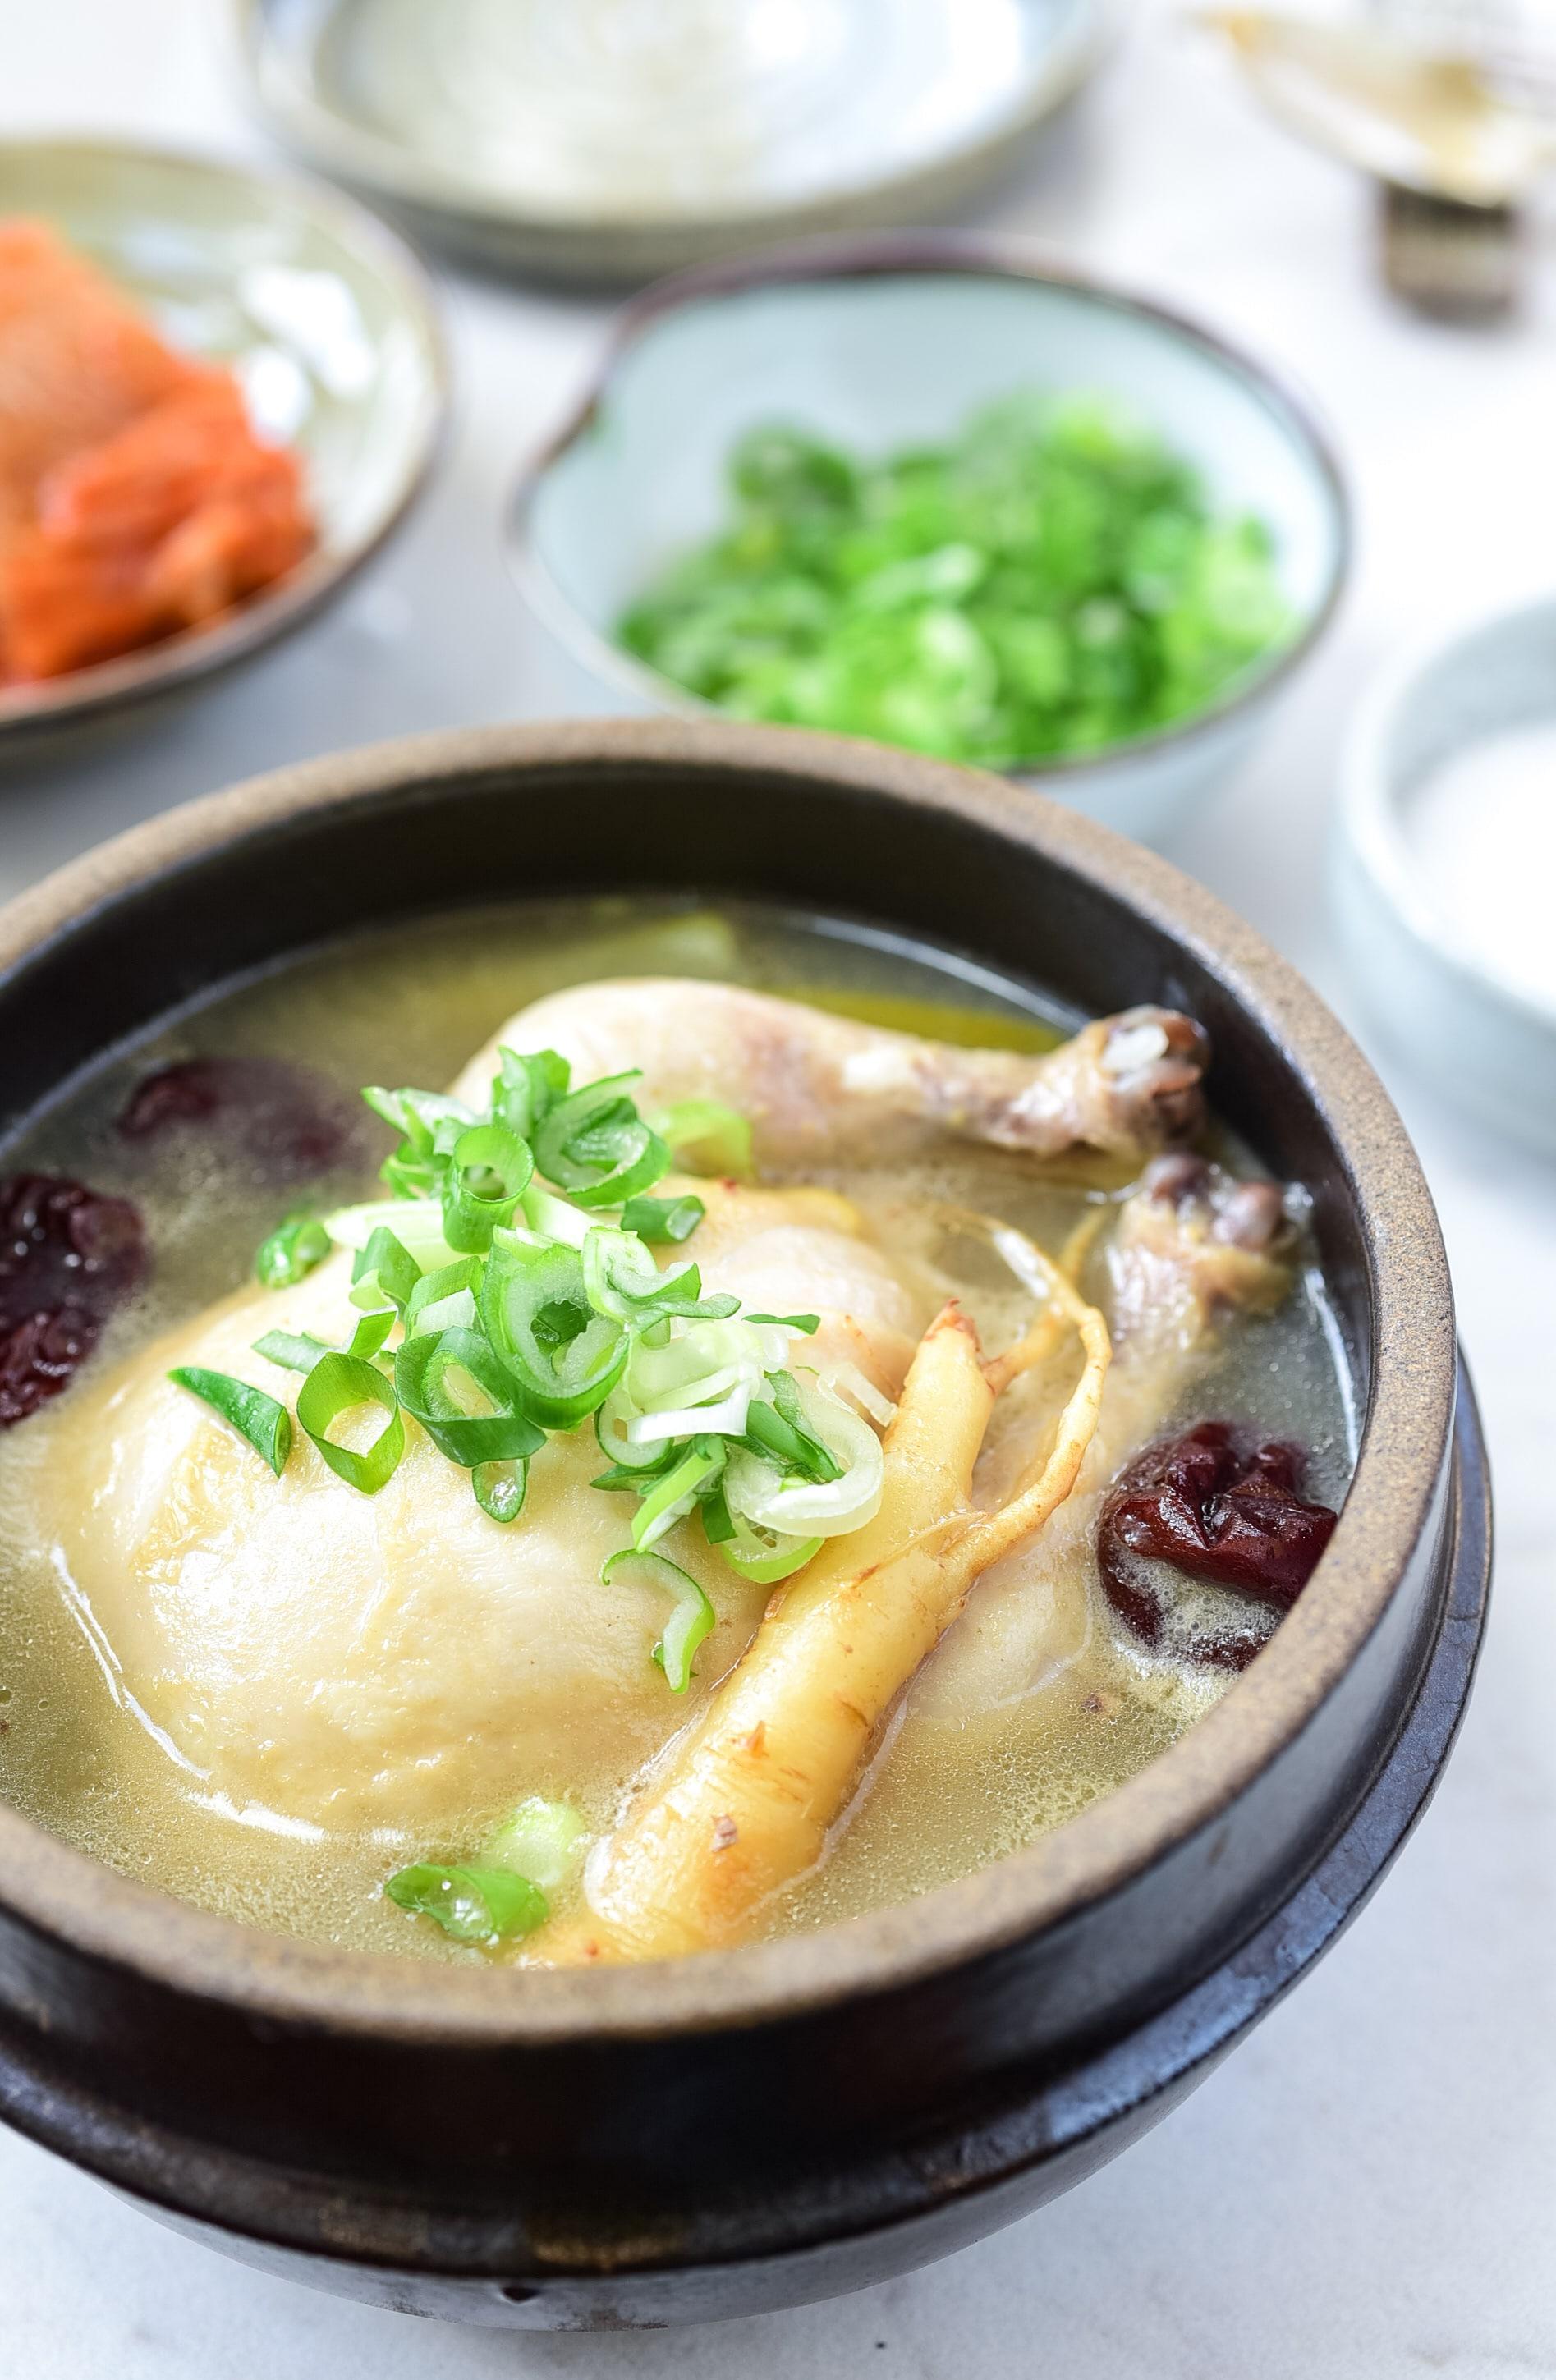 DSC 5098 1 - Samgyetang (Ginseng Chicken Soup)